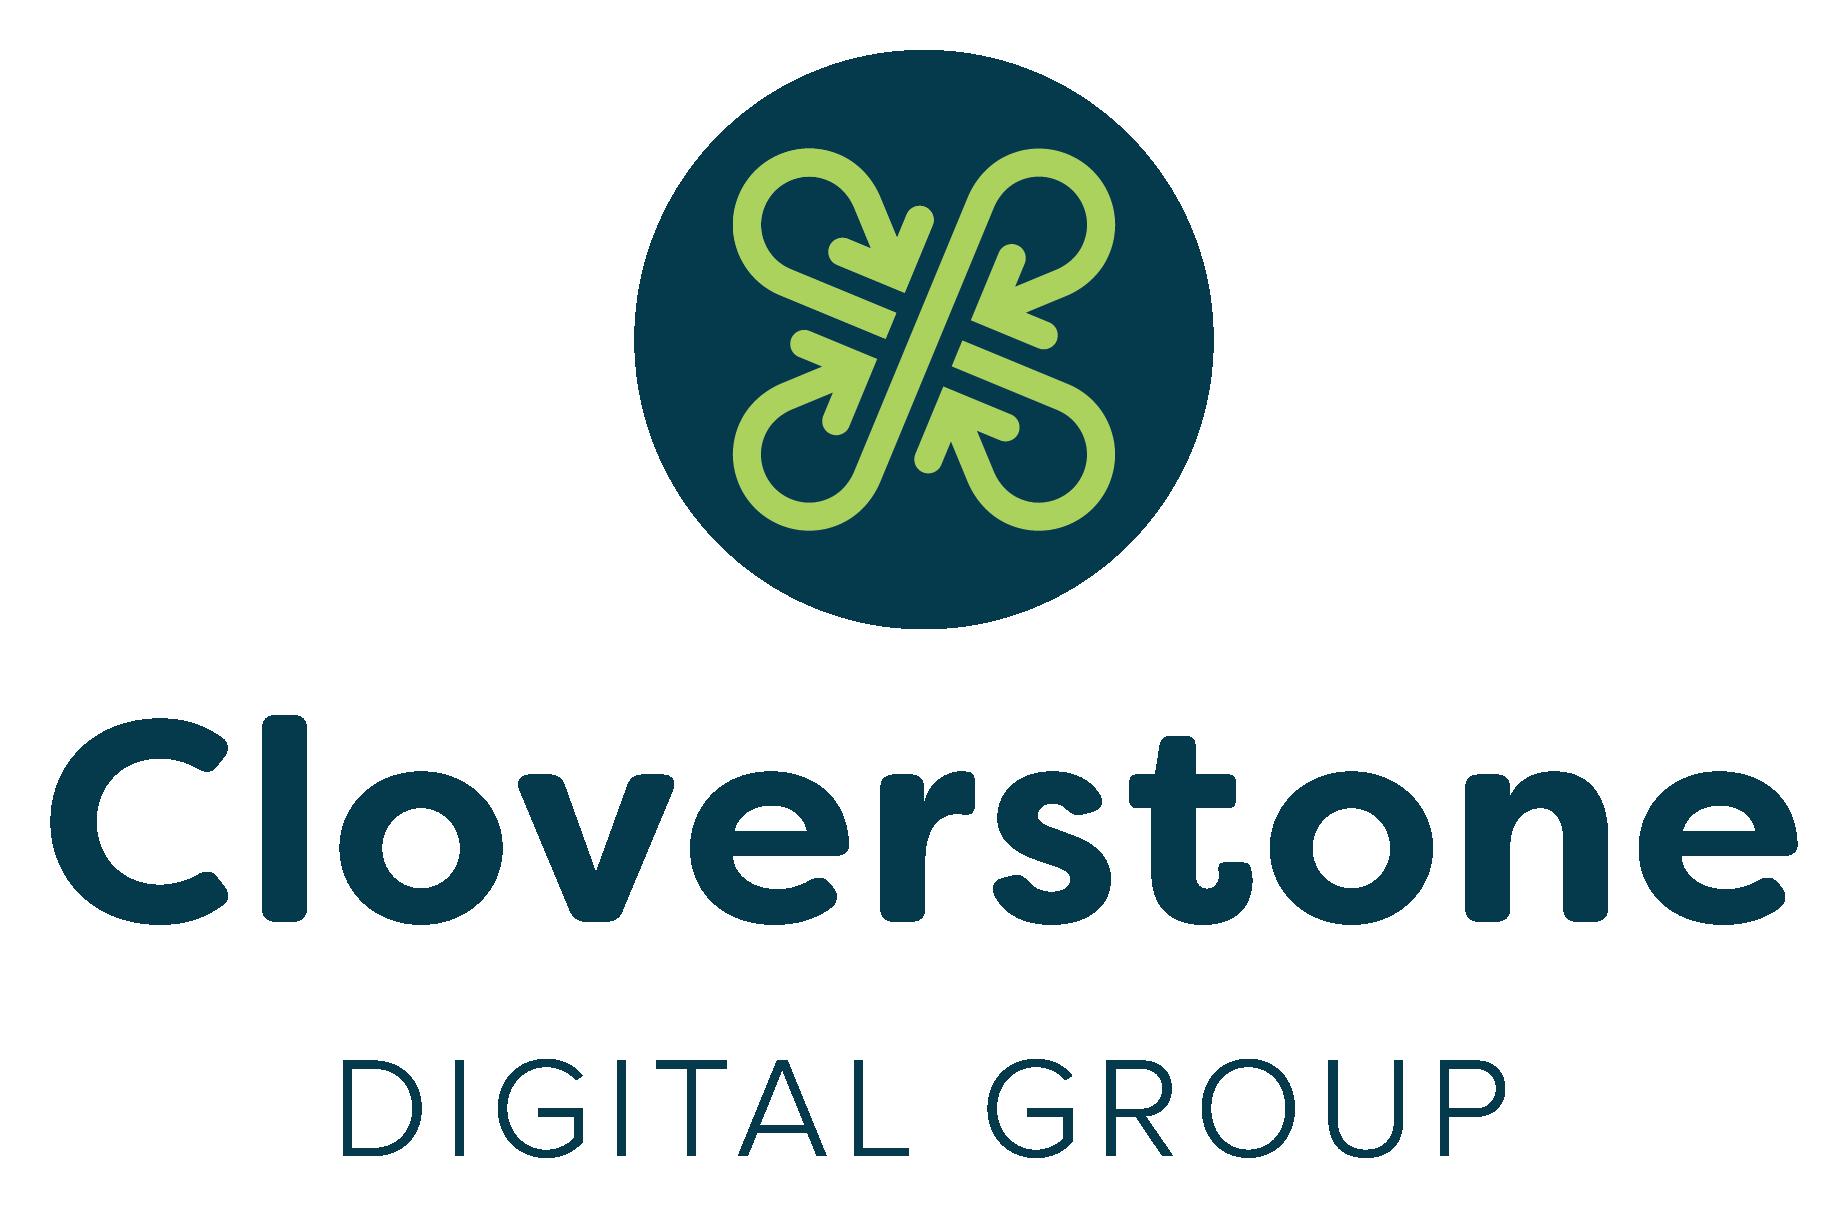 Cloverstone Digital Group logo